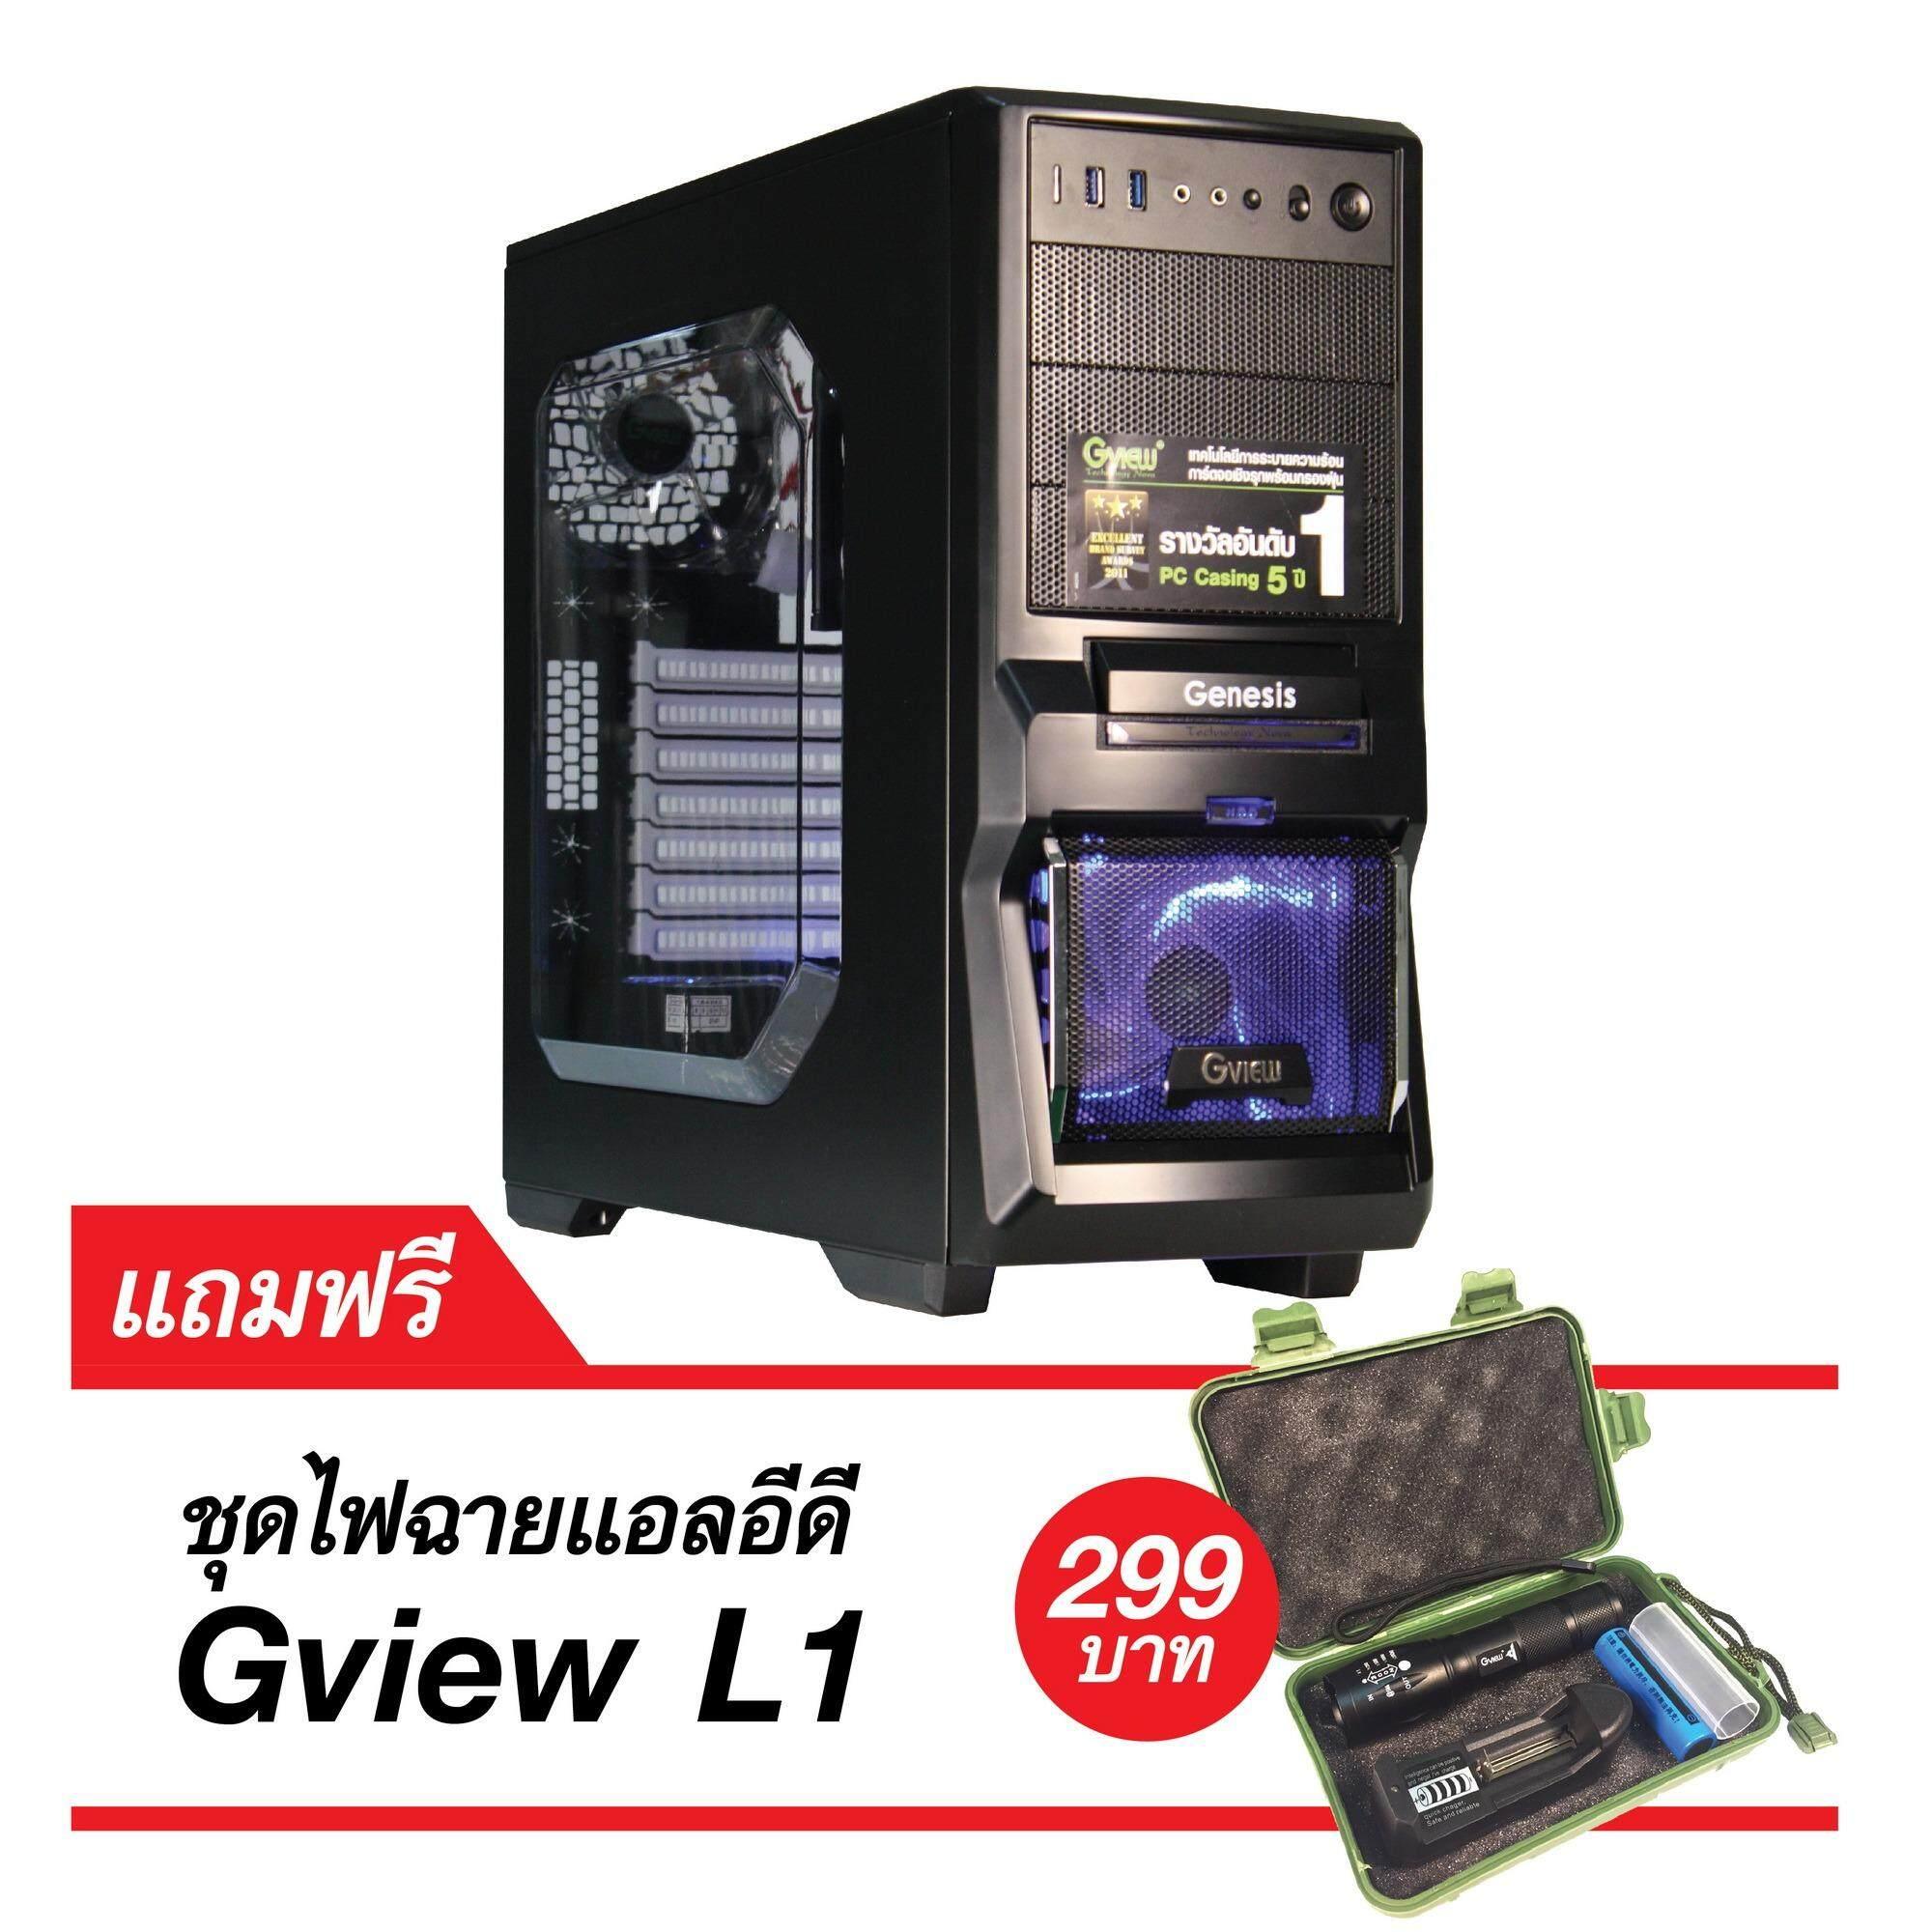 Gviewเคสเปล่า รุ่นGviewGenesis(USB3.0)